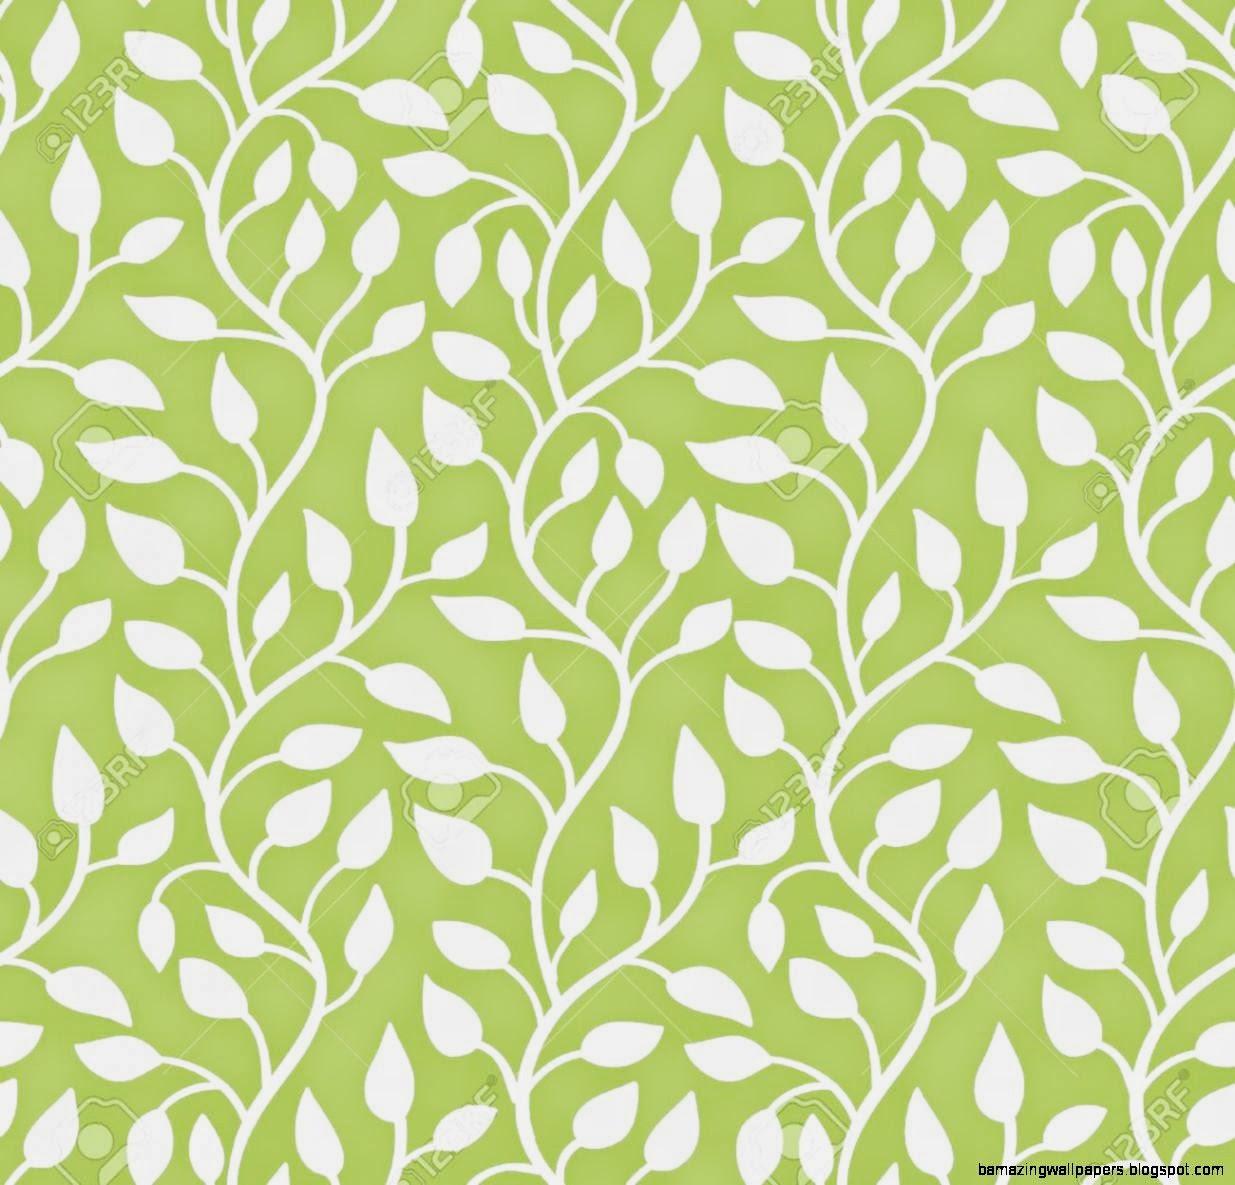 Seamless Modern Leaf Pattern Green Illustration Royalty Free